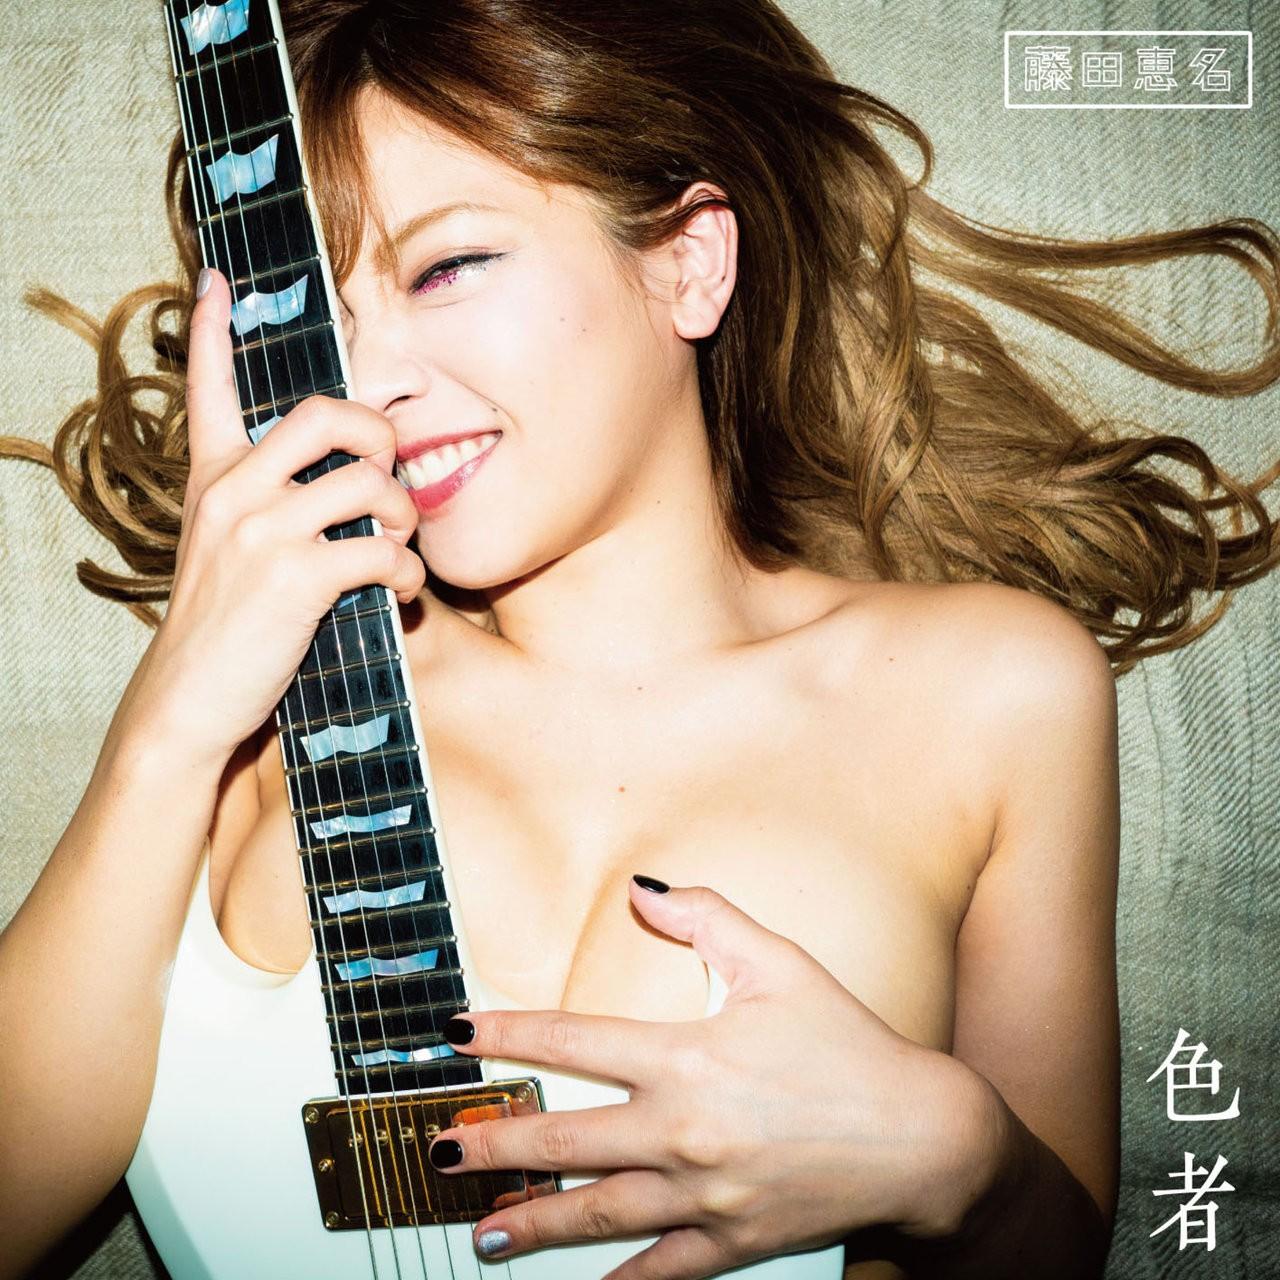 藤田恵名 (Ena Fujita) – 色者 [FLAC + MP3 320 / WEB] [2019.06.26]